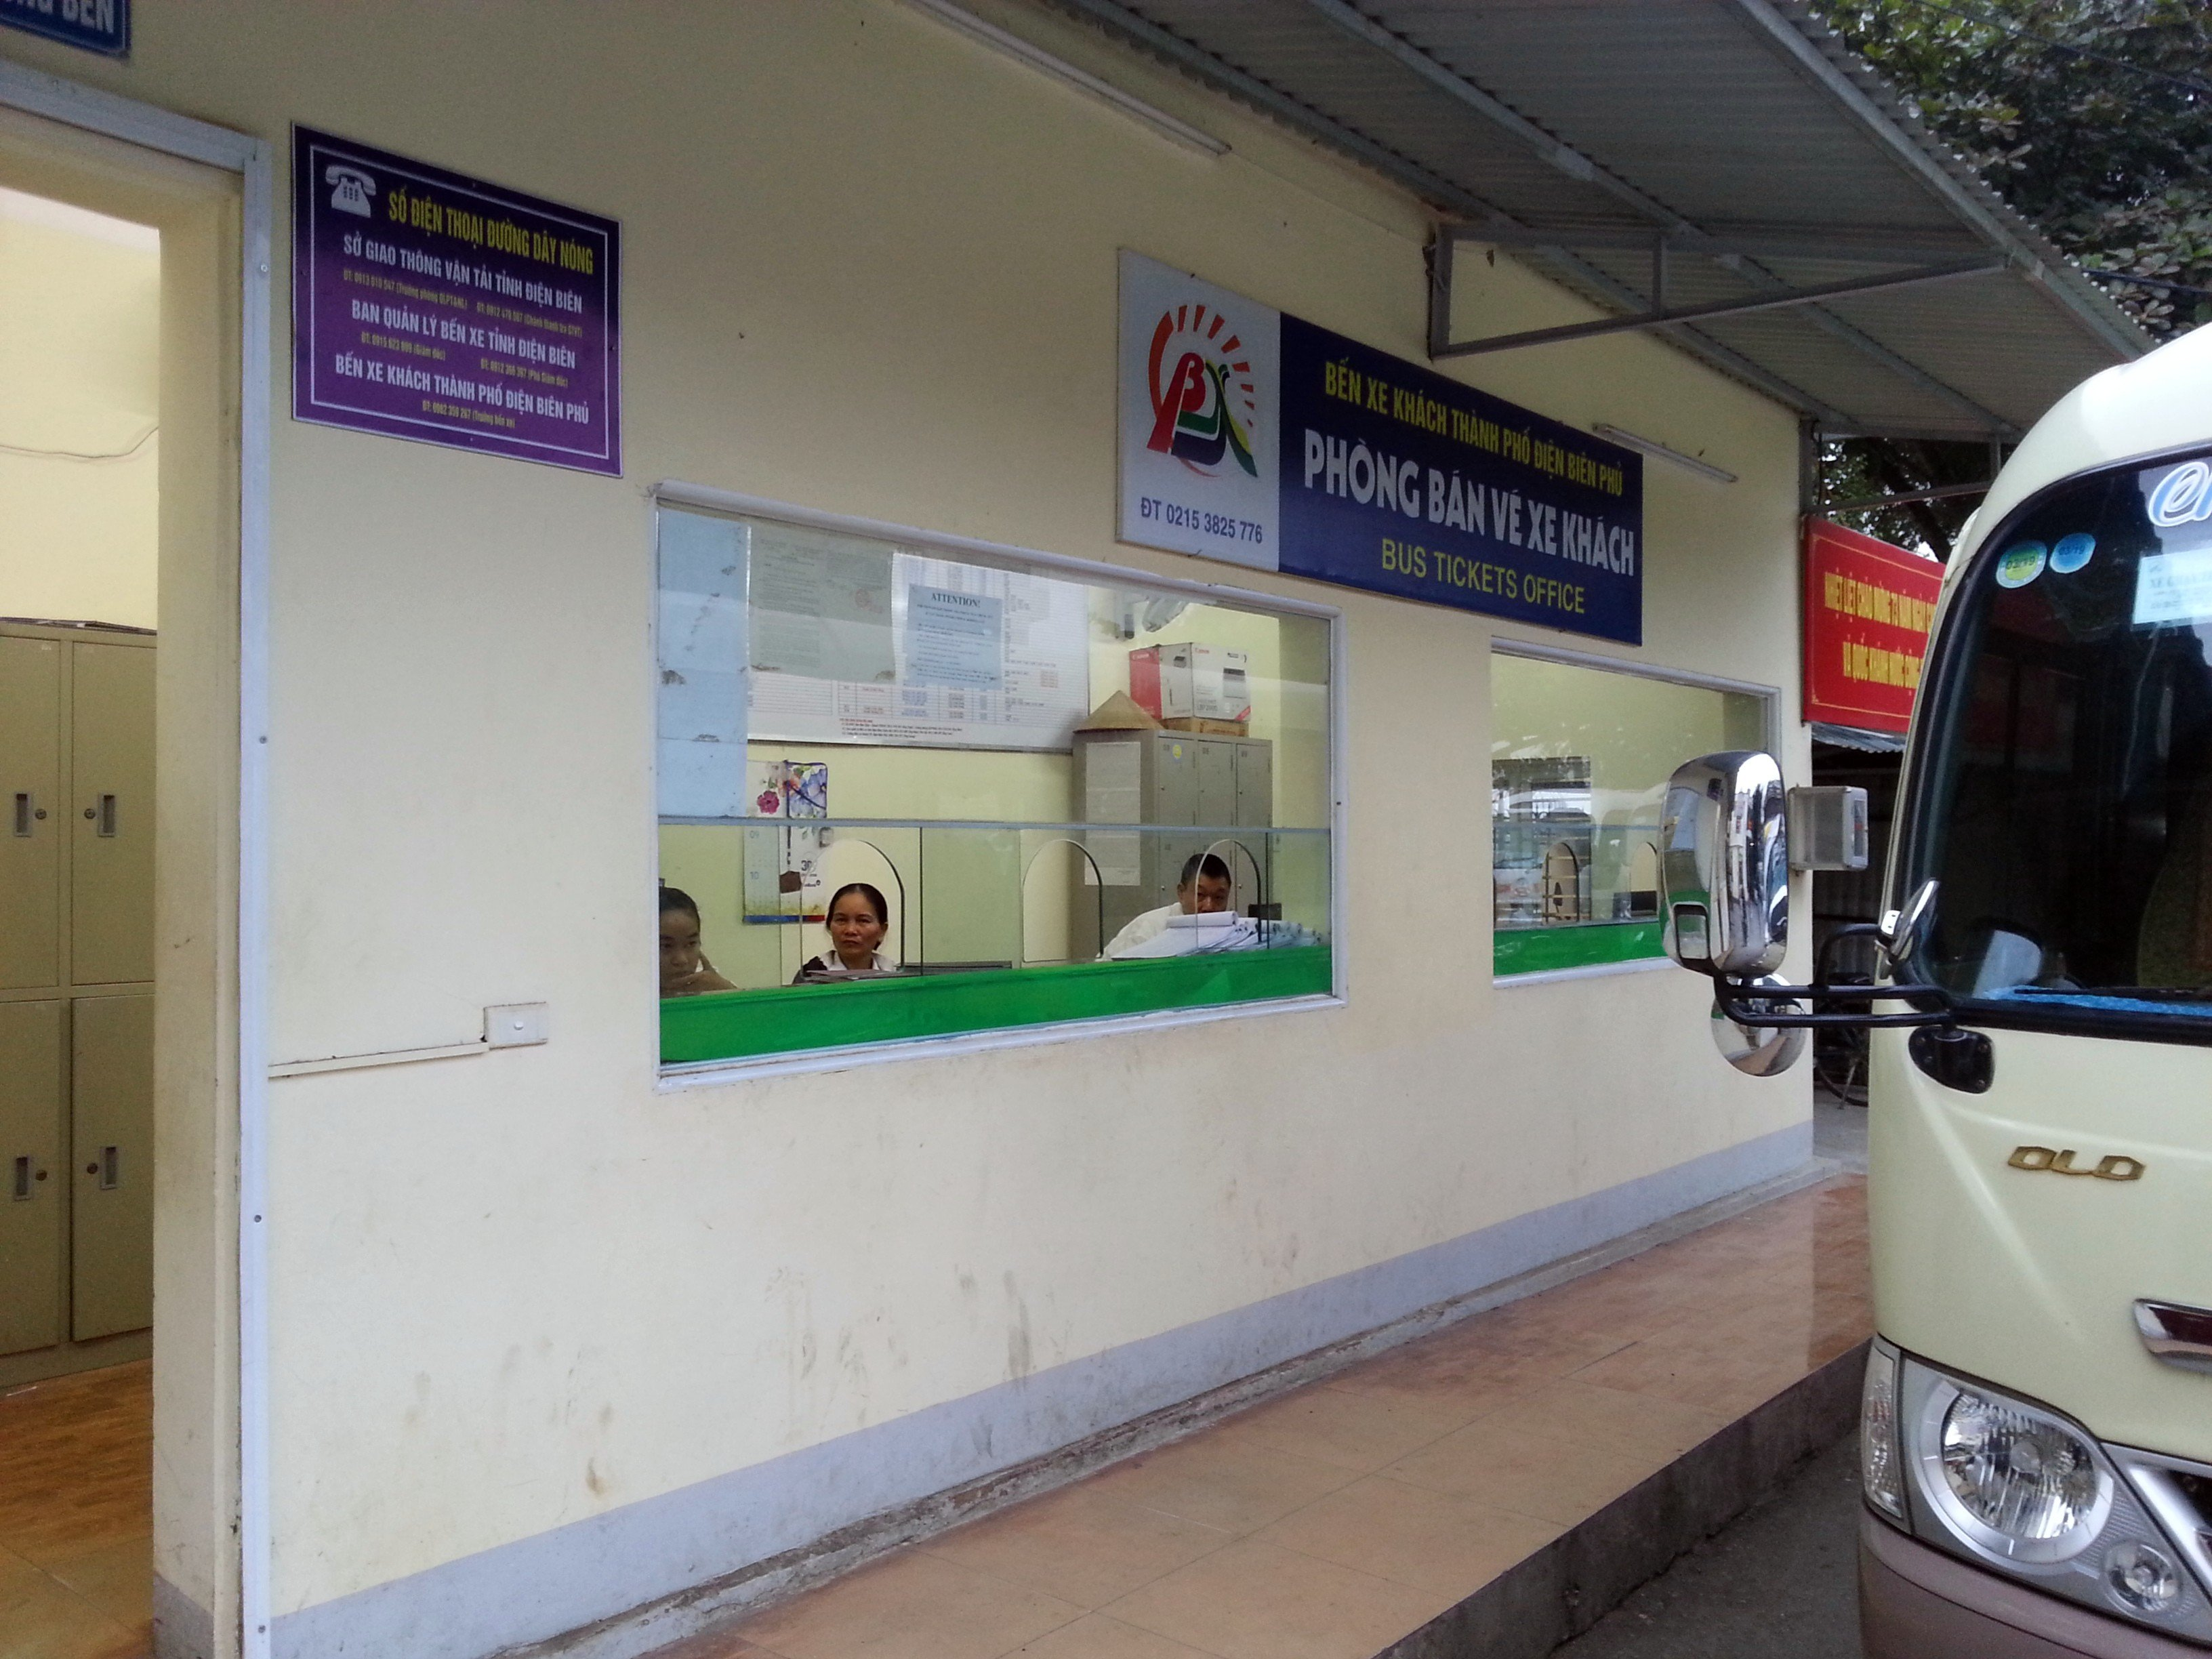 Ticket Counter at Dien Bien Phu Bus Station